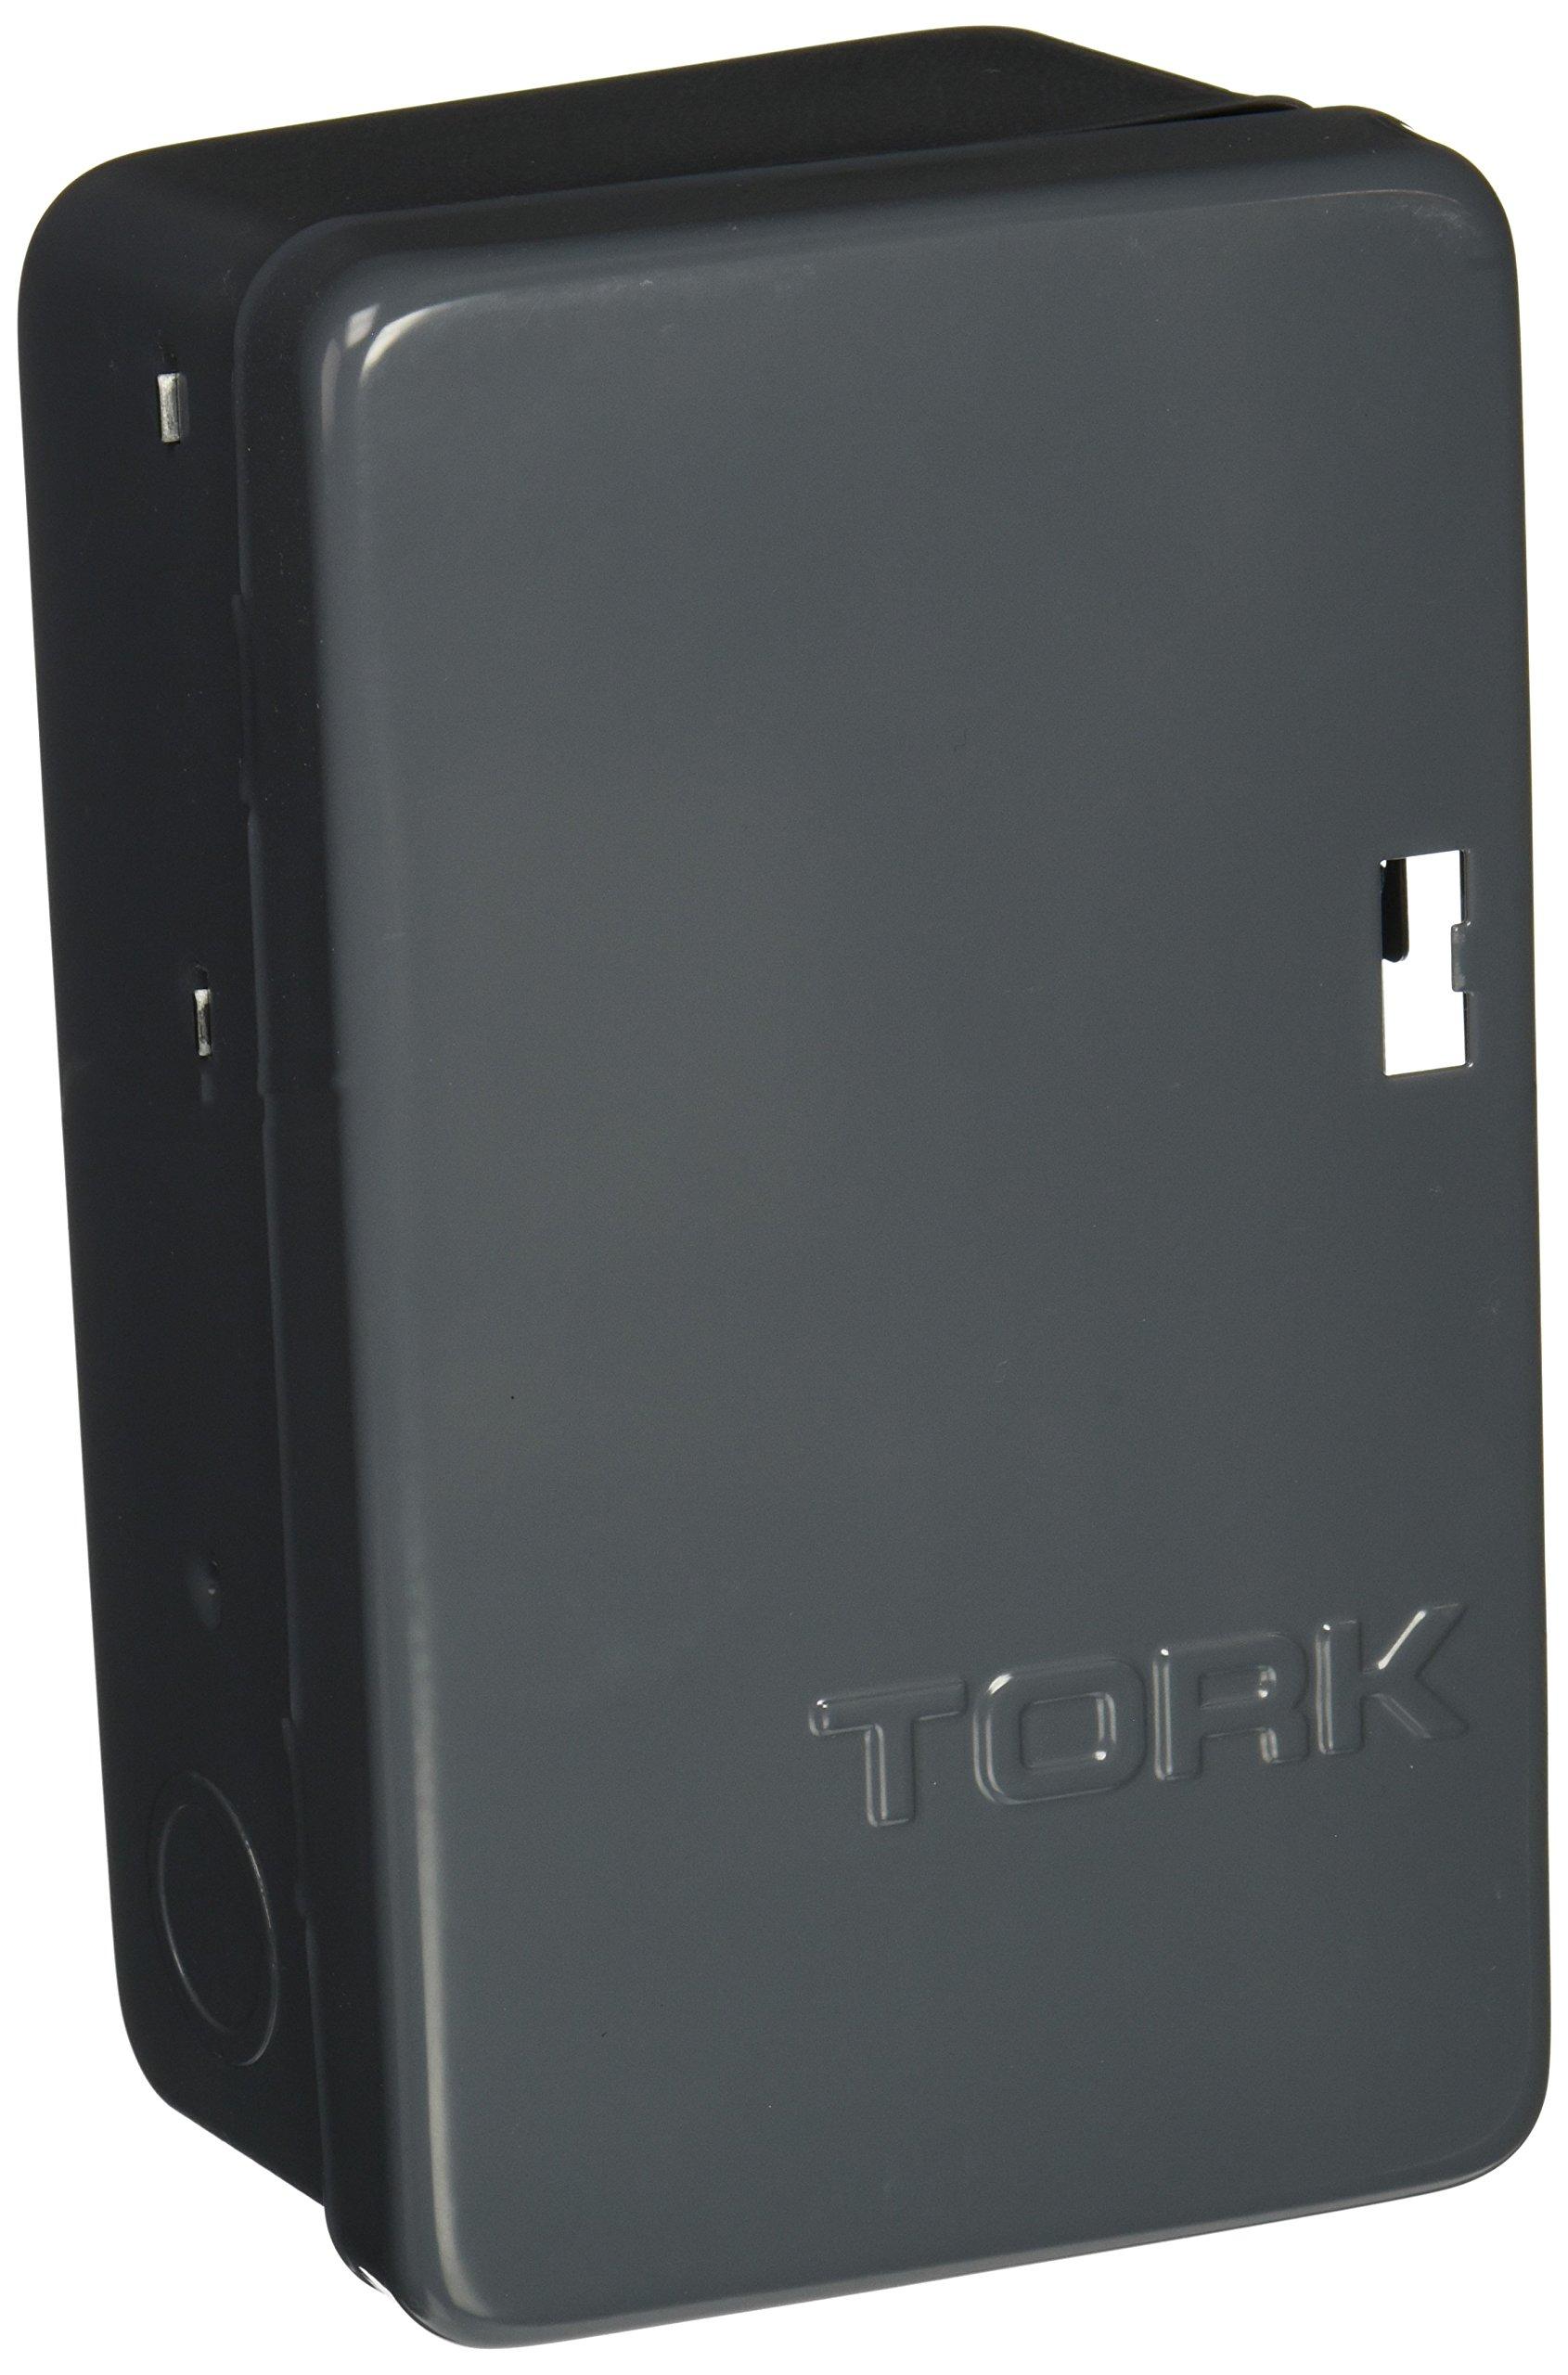 Tork 1103b Dpst 40a 125v 24hr. Dial Timer by Tork